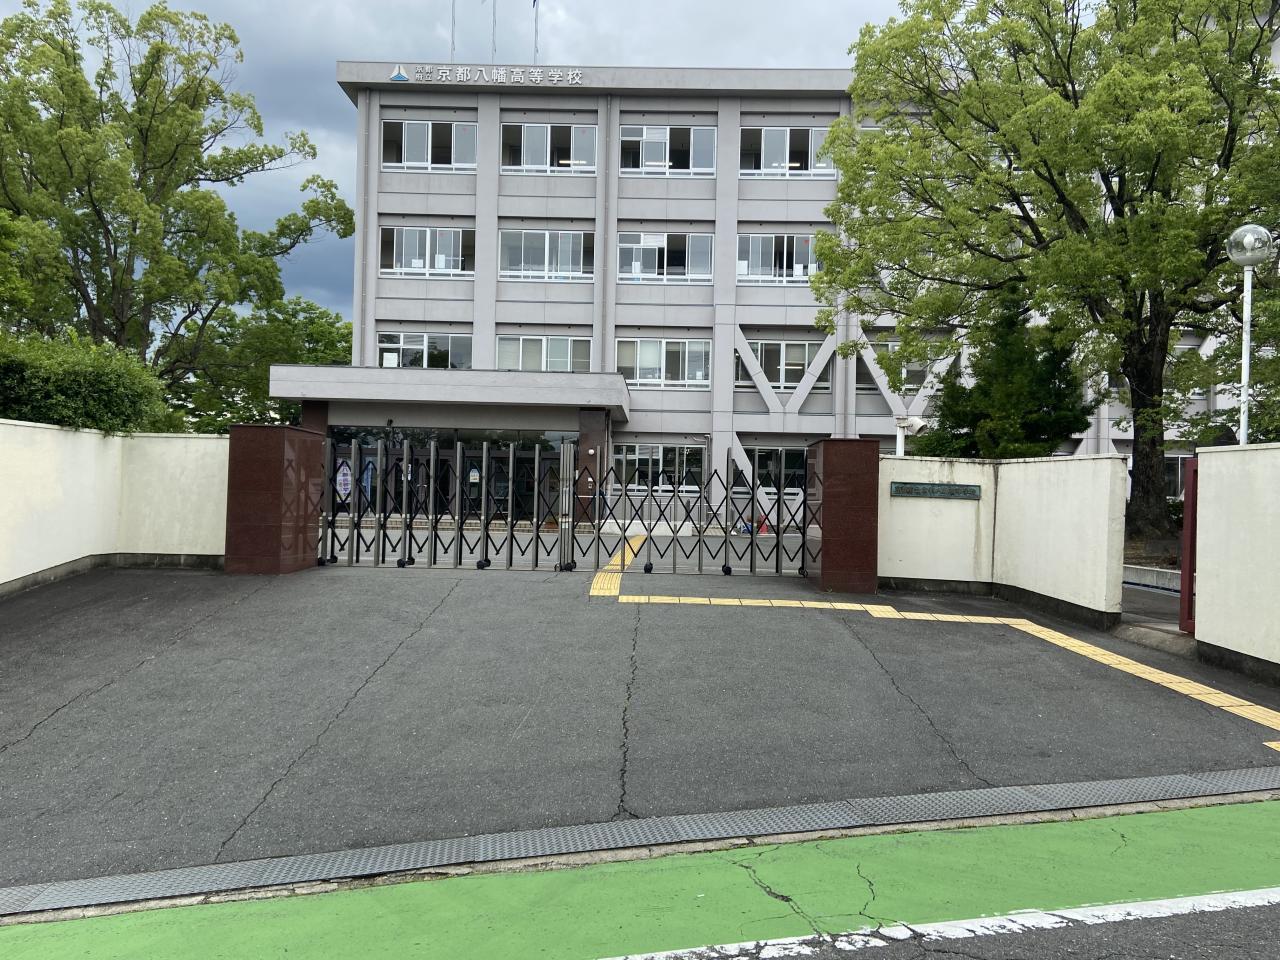 京都府立京都八幡高等学校 北キャンパス